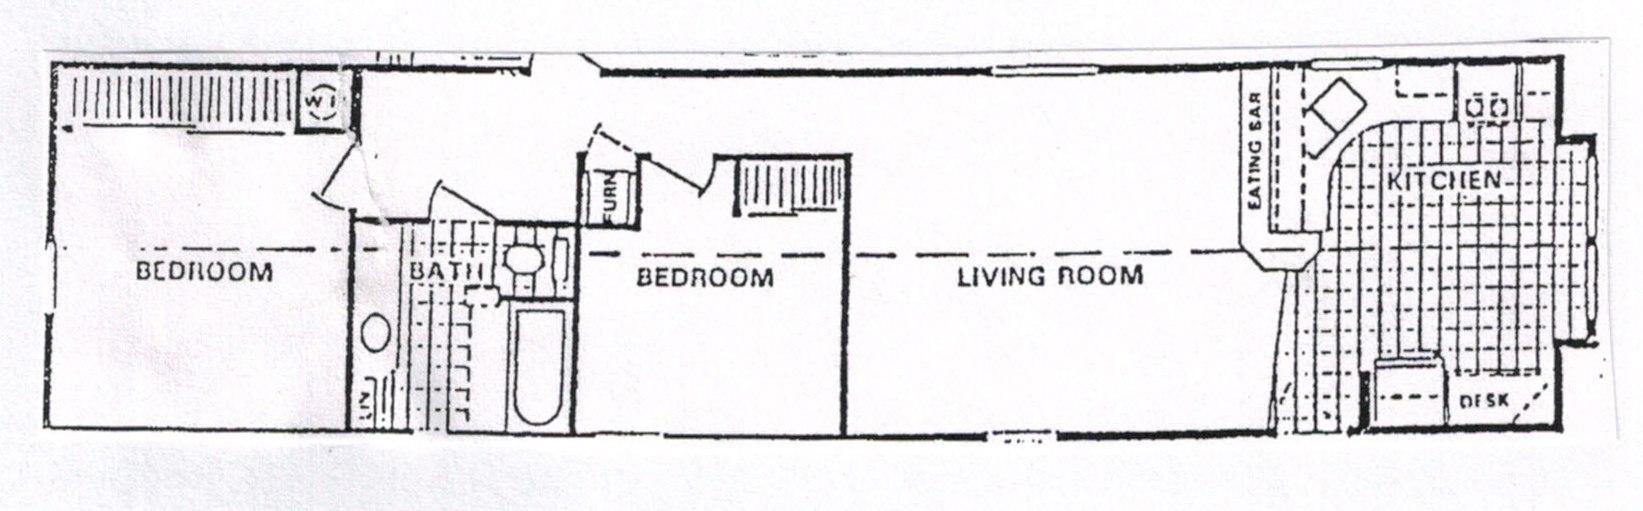 37 Raymor Floor Plan